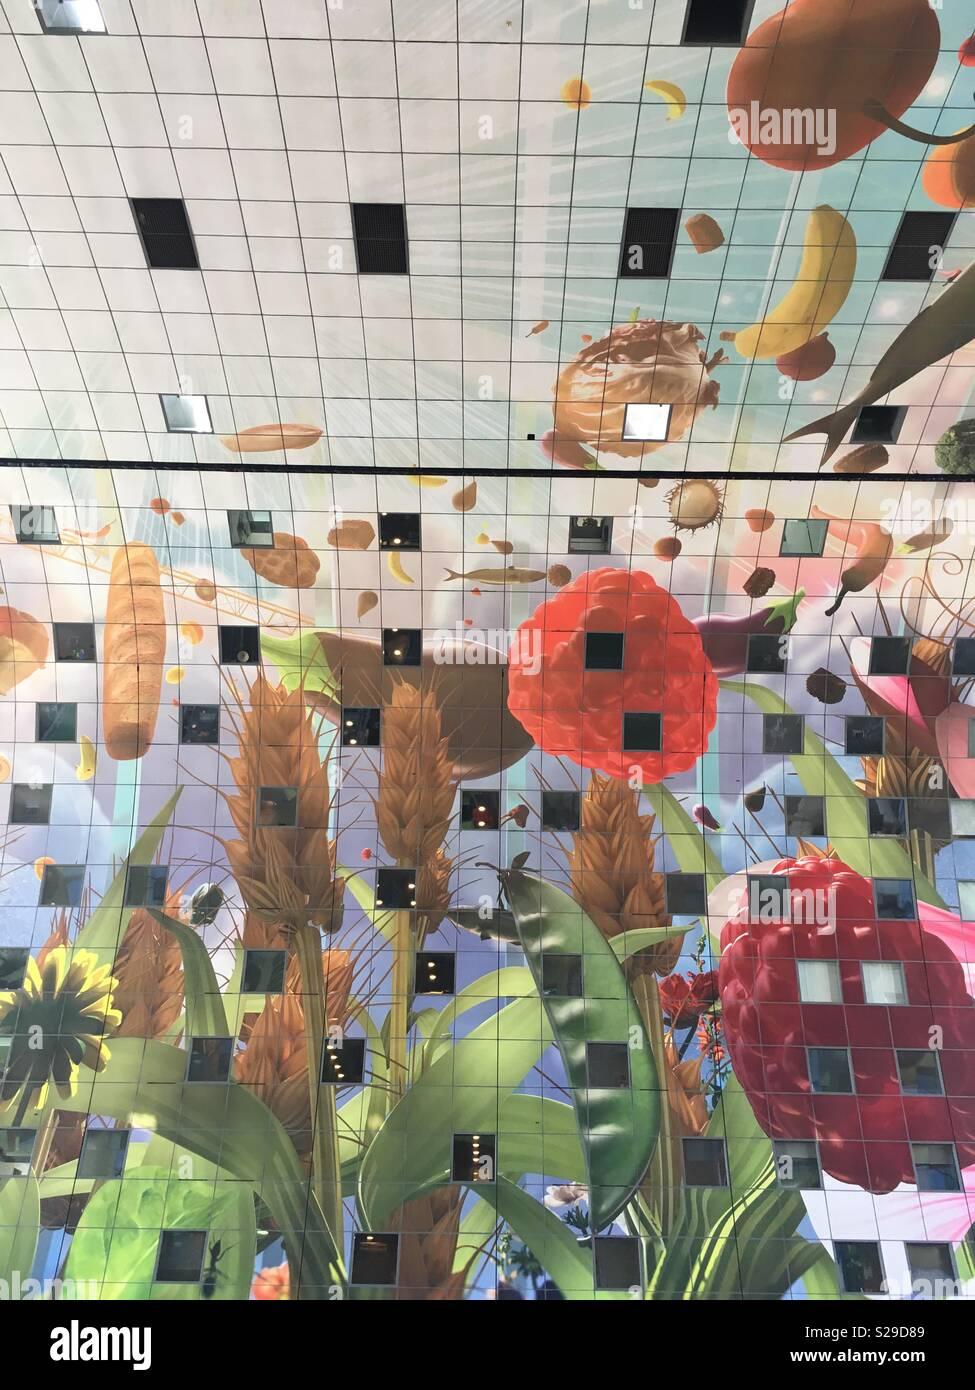 Markthalle Stock Photos Markthalle Stock Images Alamy